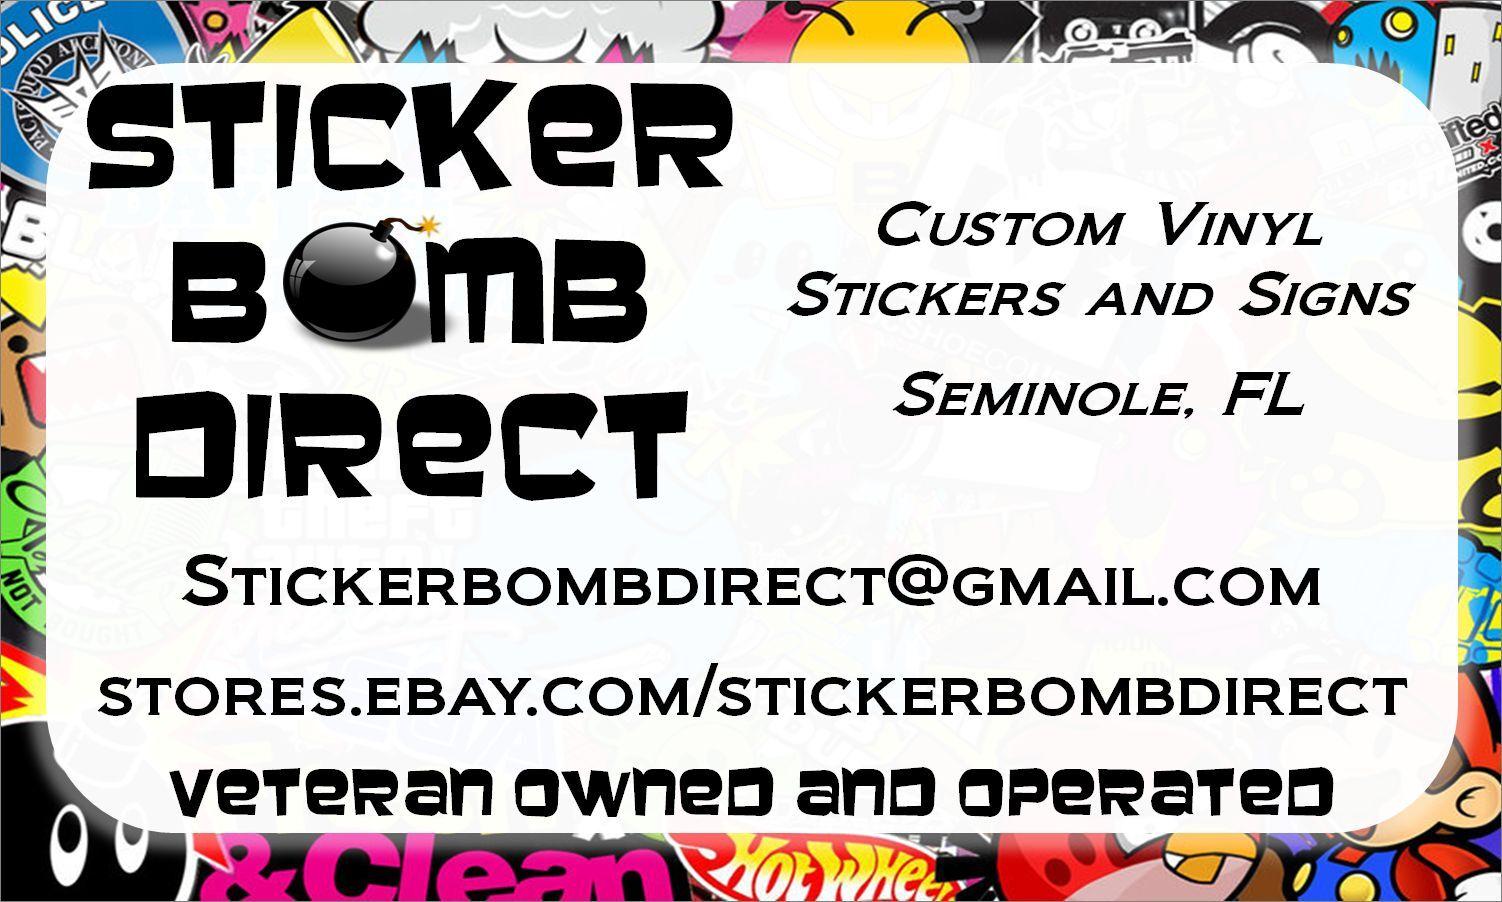 Sticker Bomb Direct